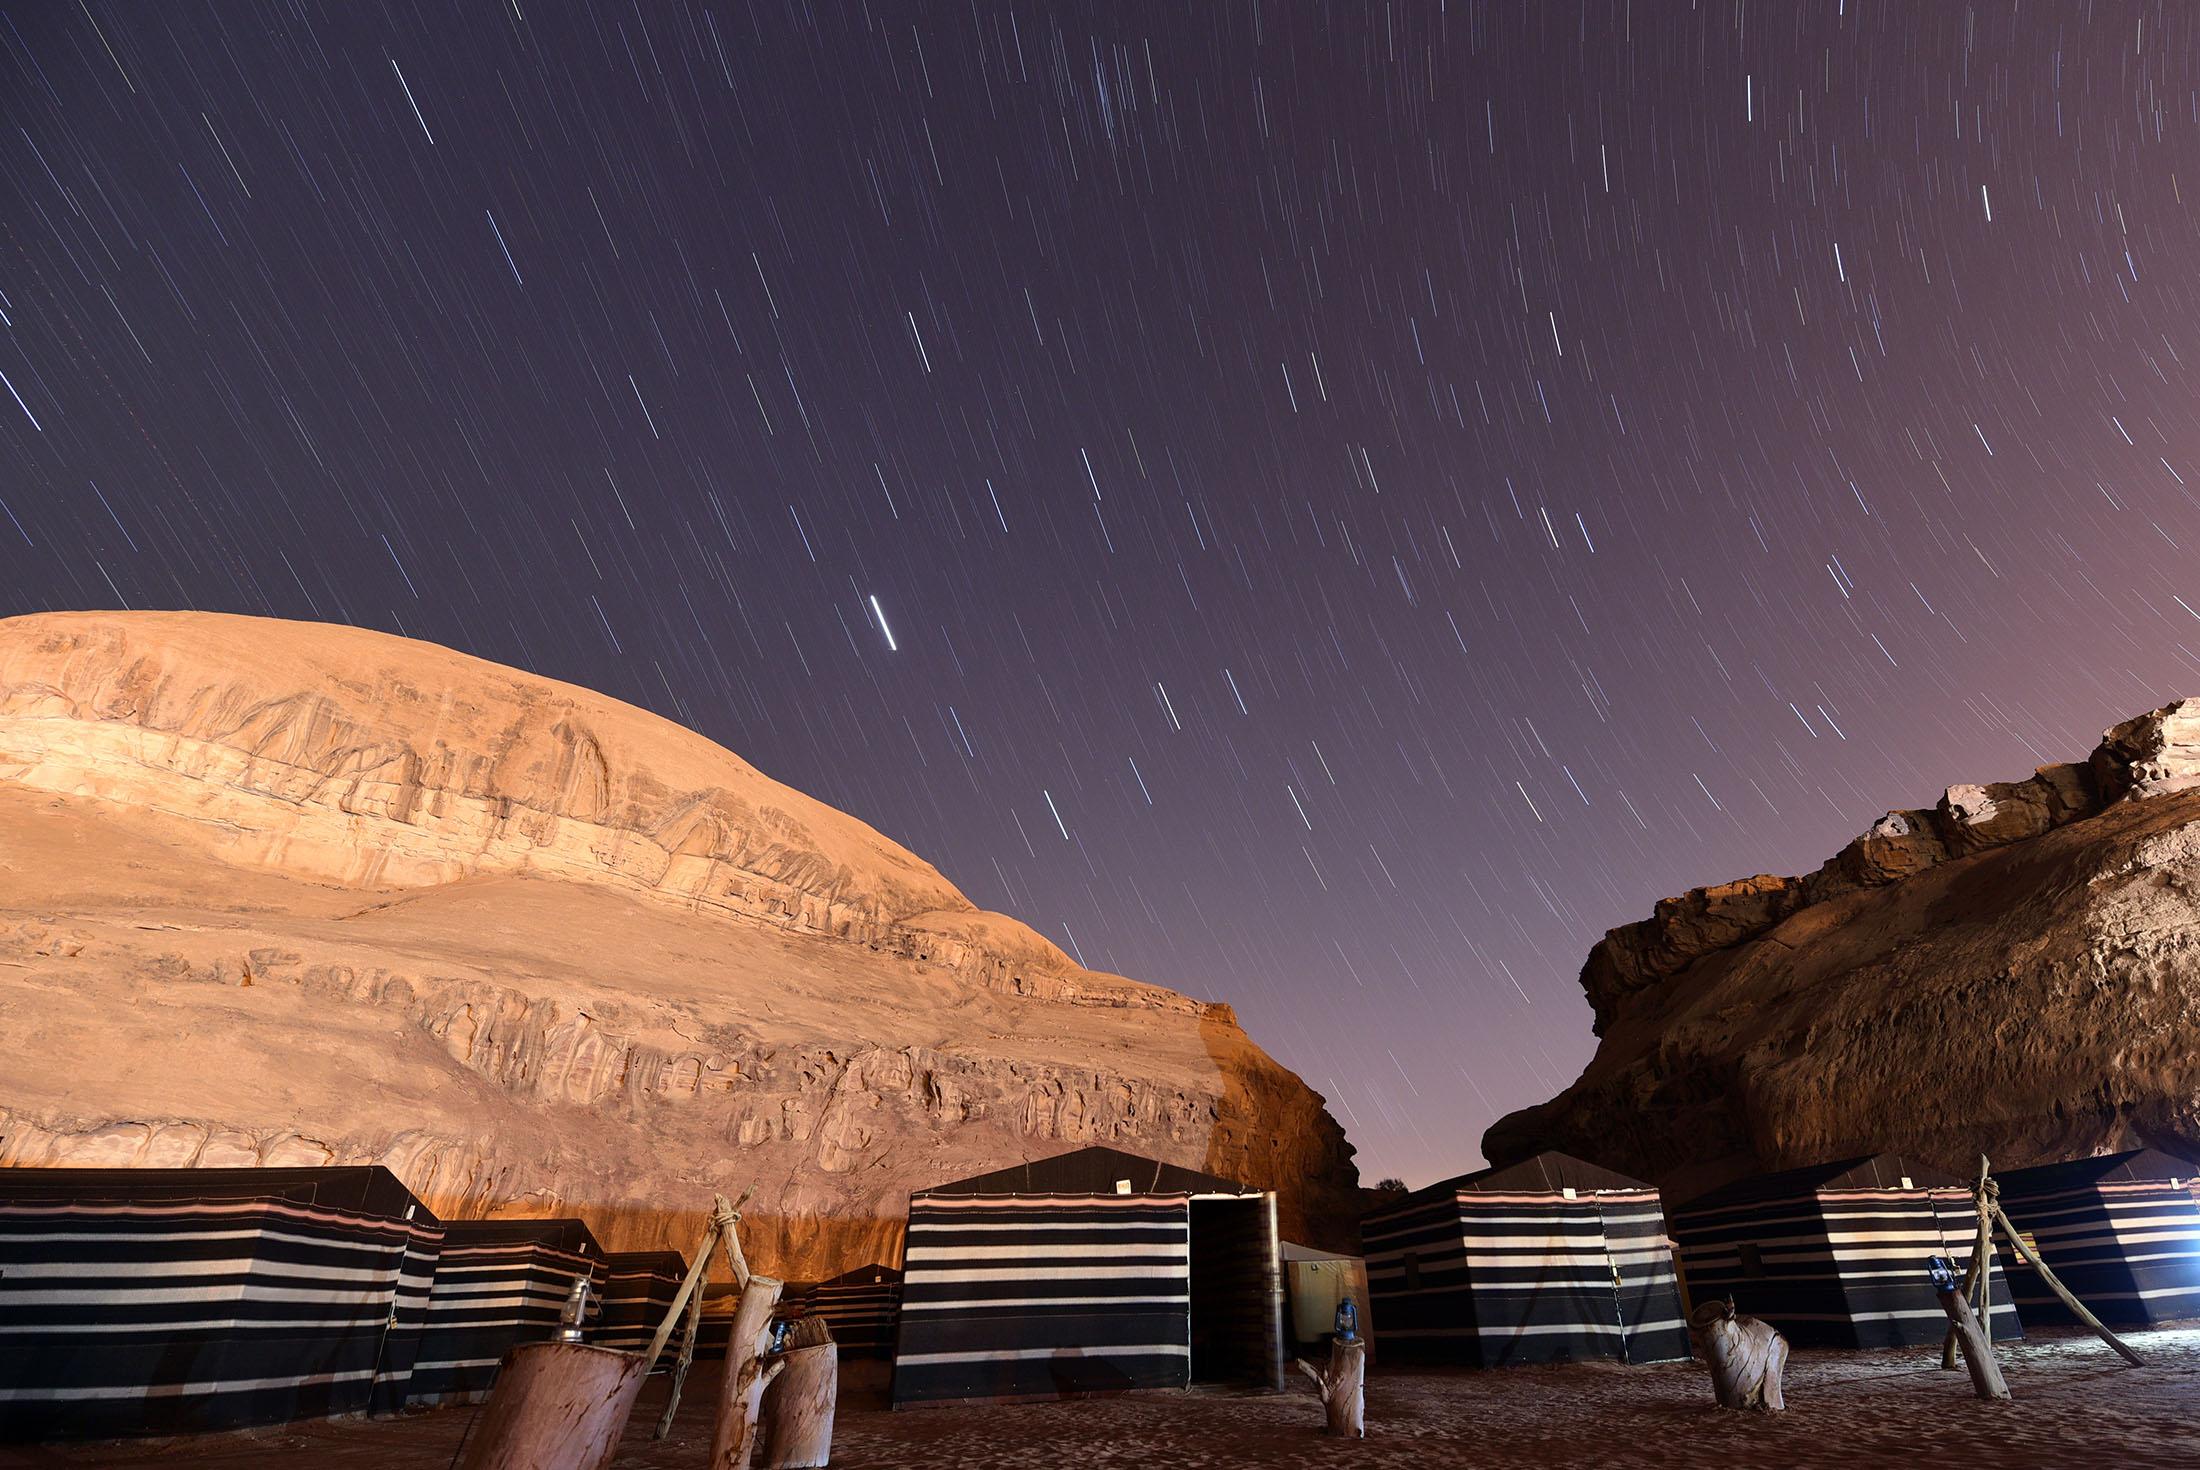 Wadi Rum Experience - Independent 1